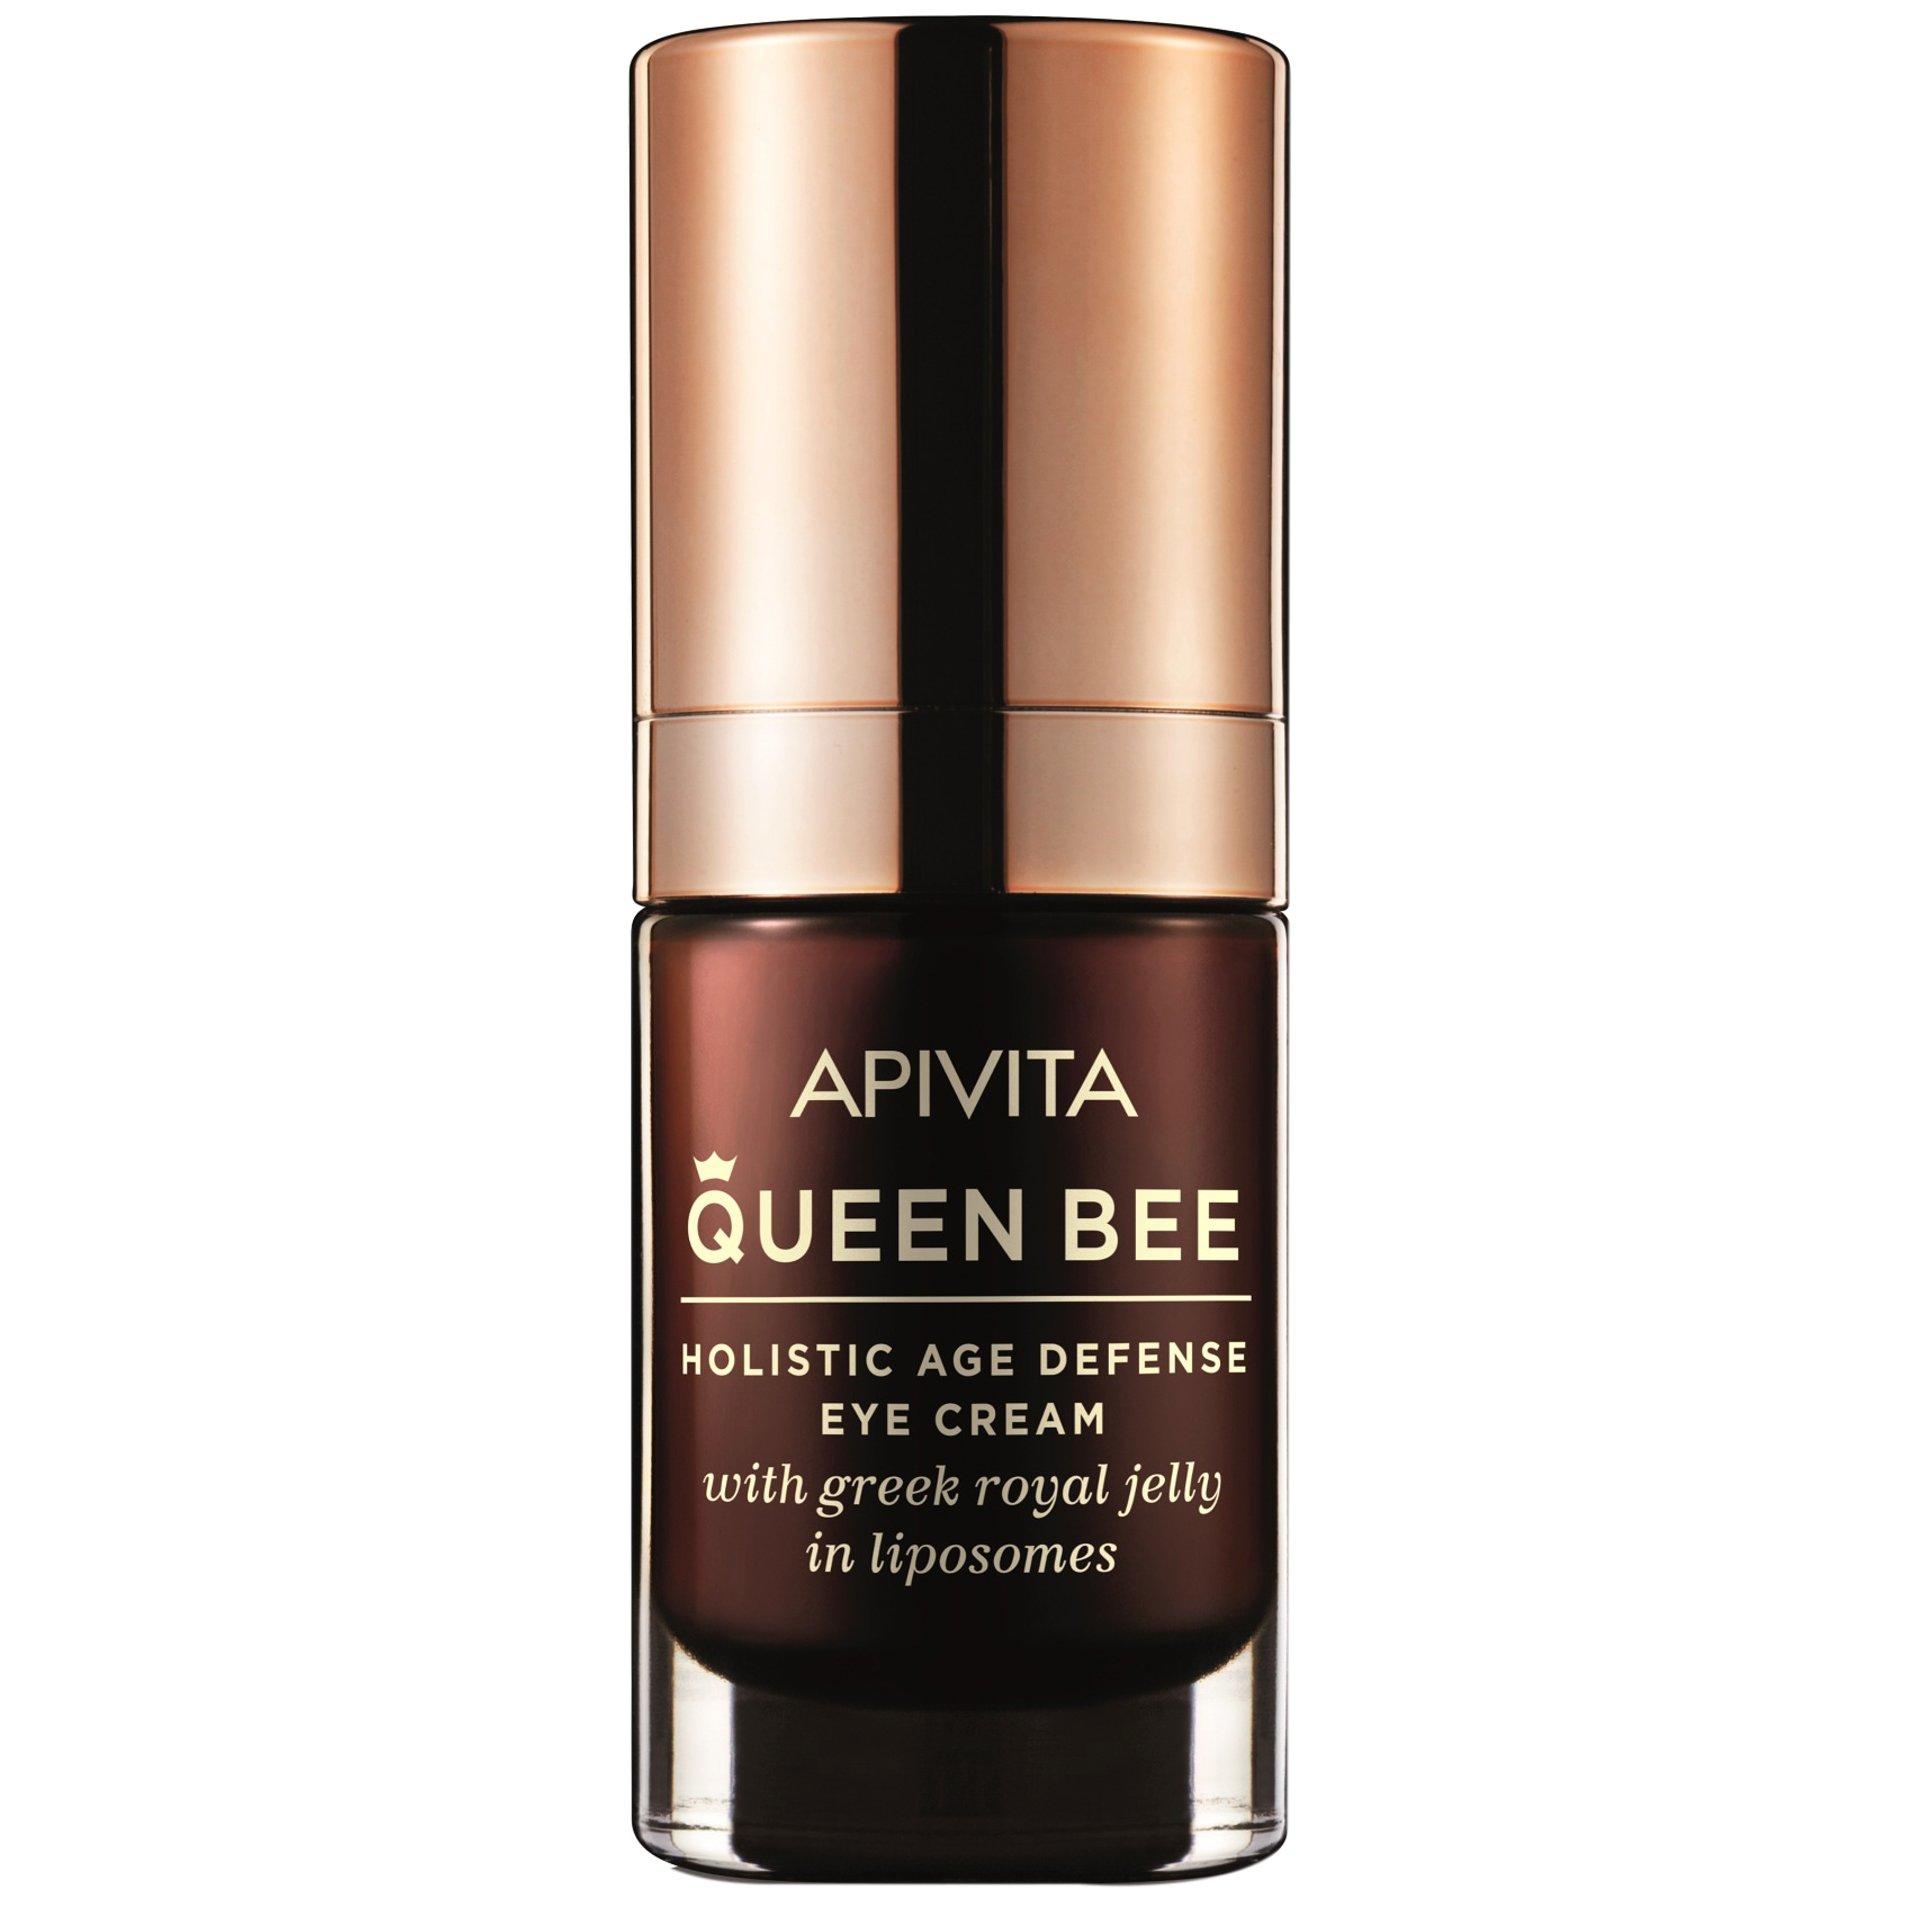 Apivita Queen Bee Kρέμα Lifting Ματιών Ολιστικής Αντιγήρανσης με Ελληνικό Βασιλικό Πολτό σε Λιποσώματα 15ml